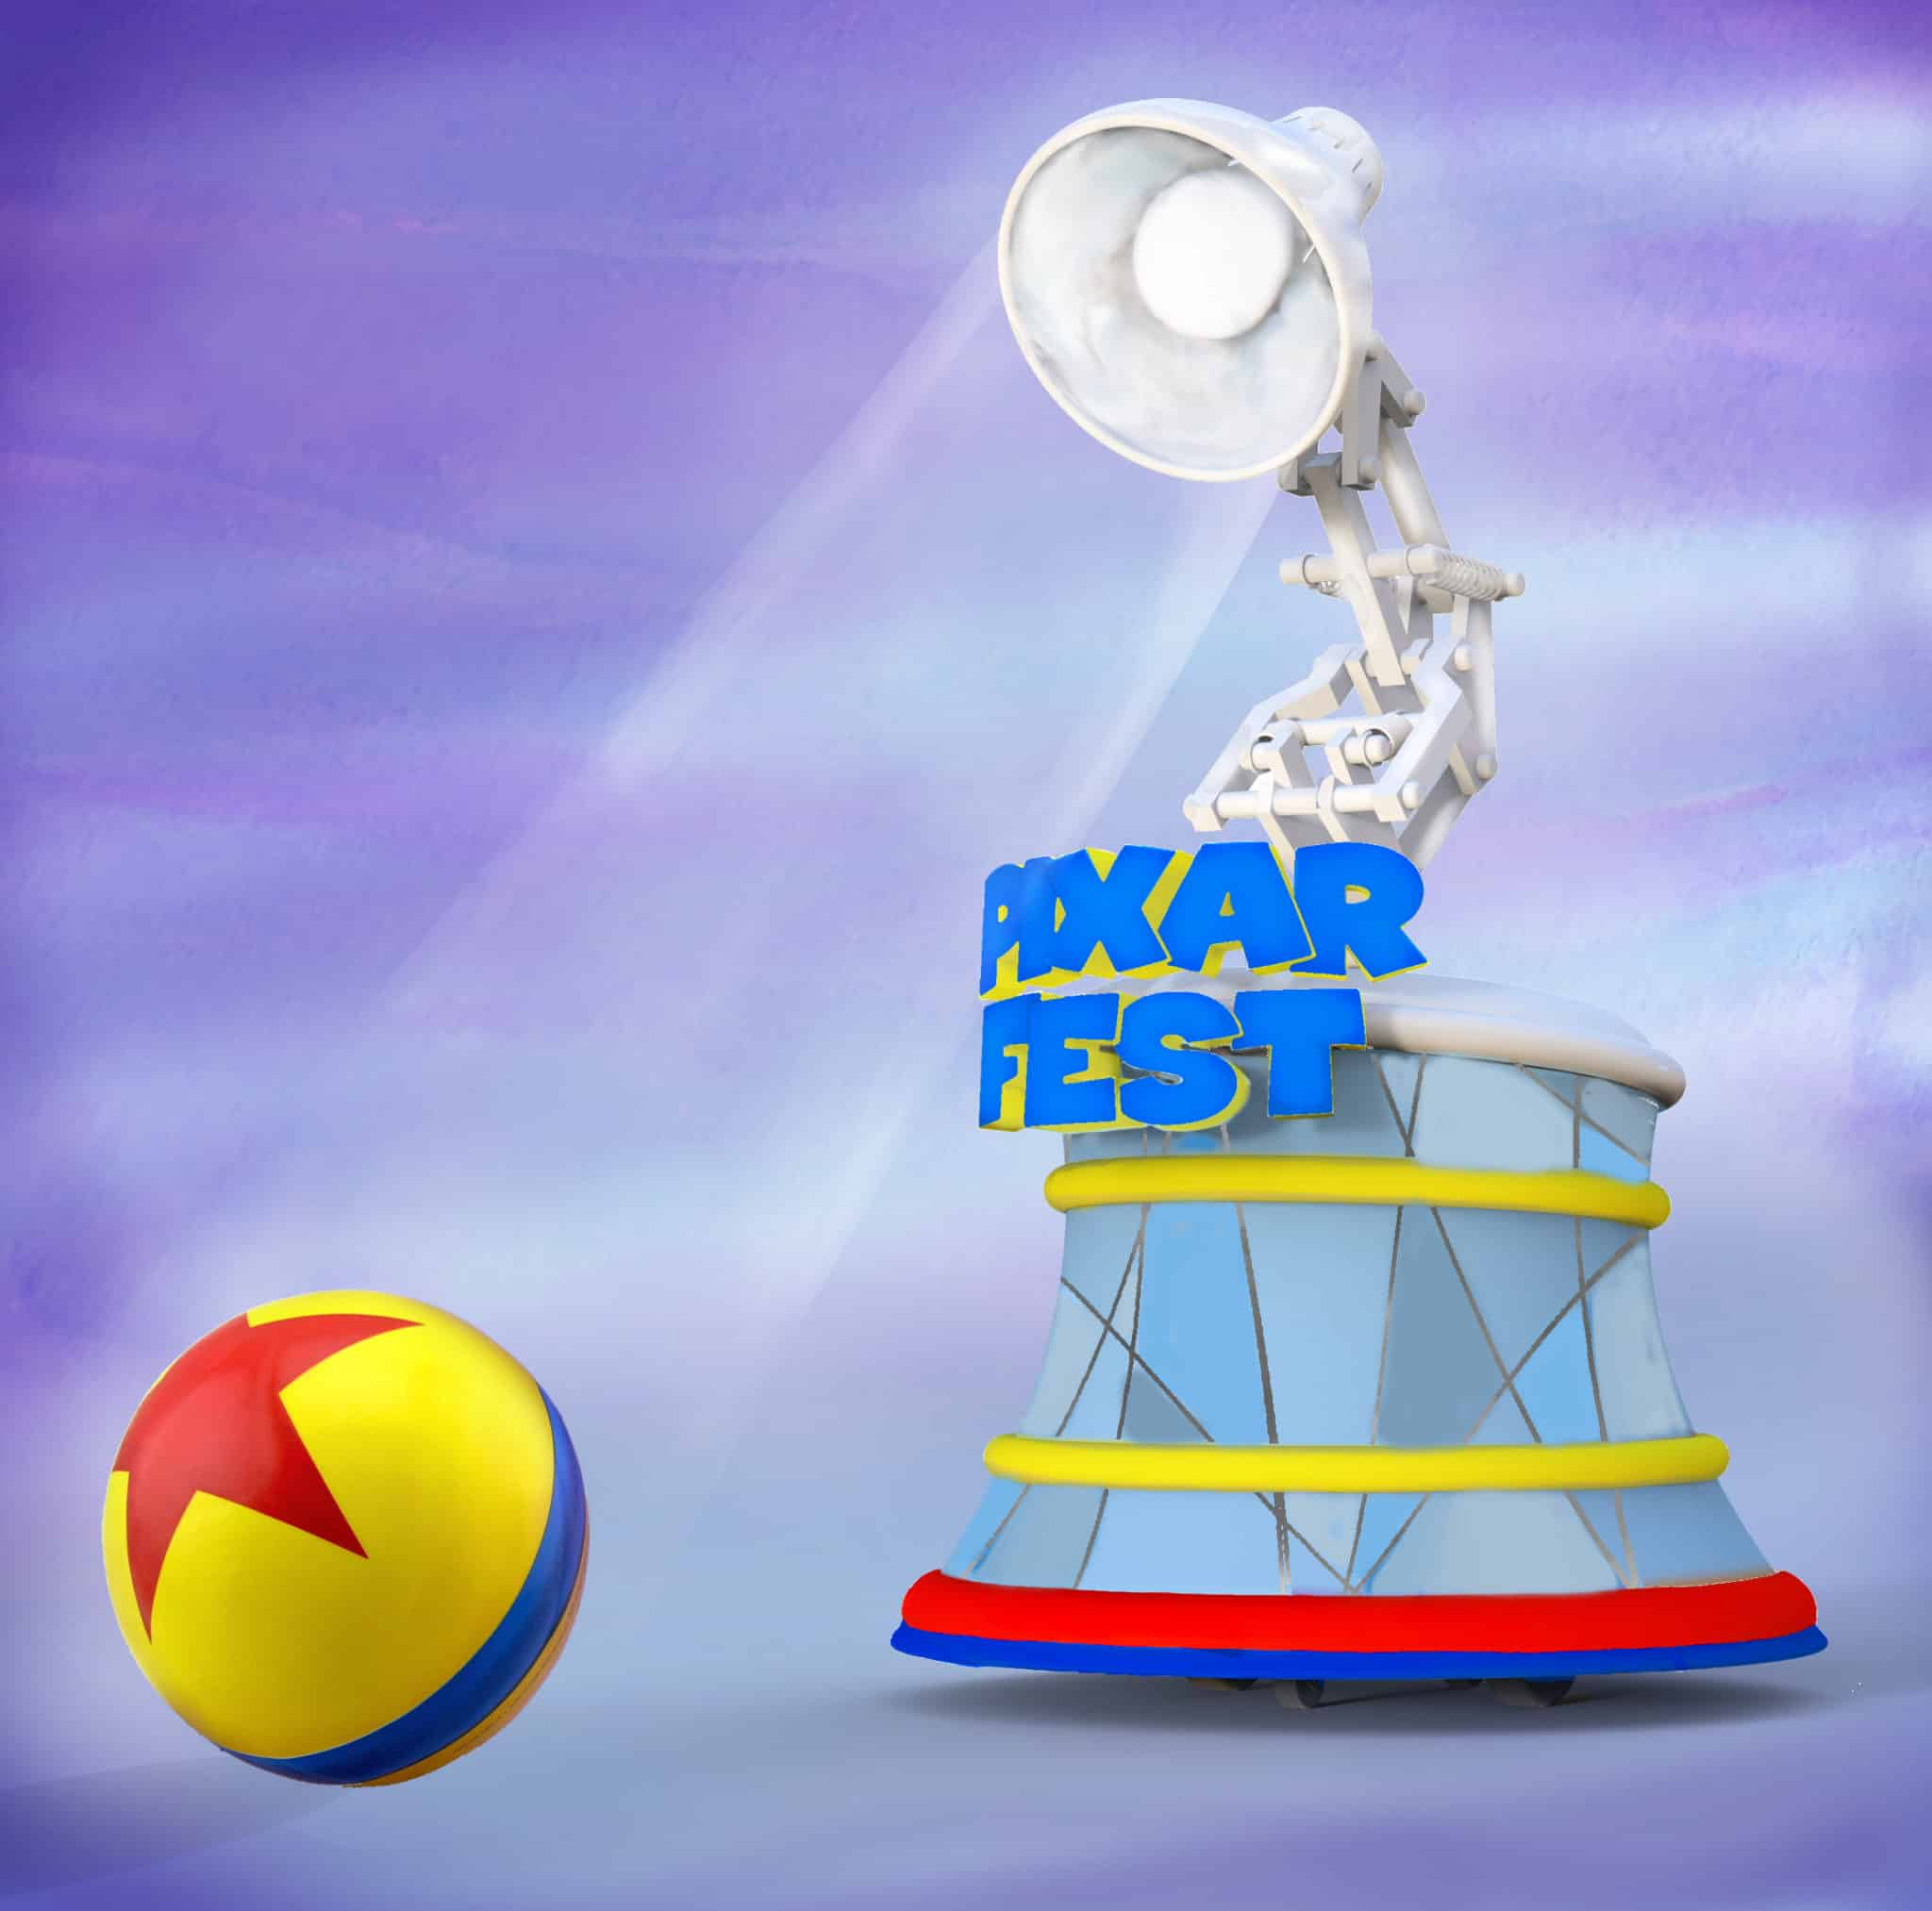 Pixar Fest float, courtesy Disneyland Resort